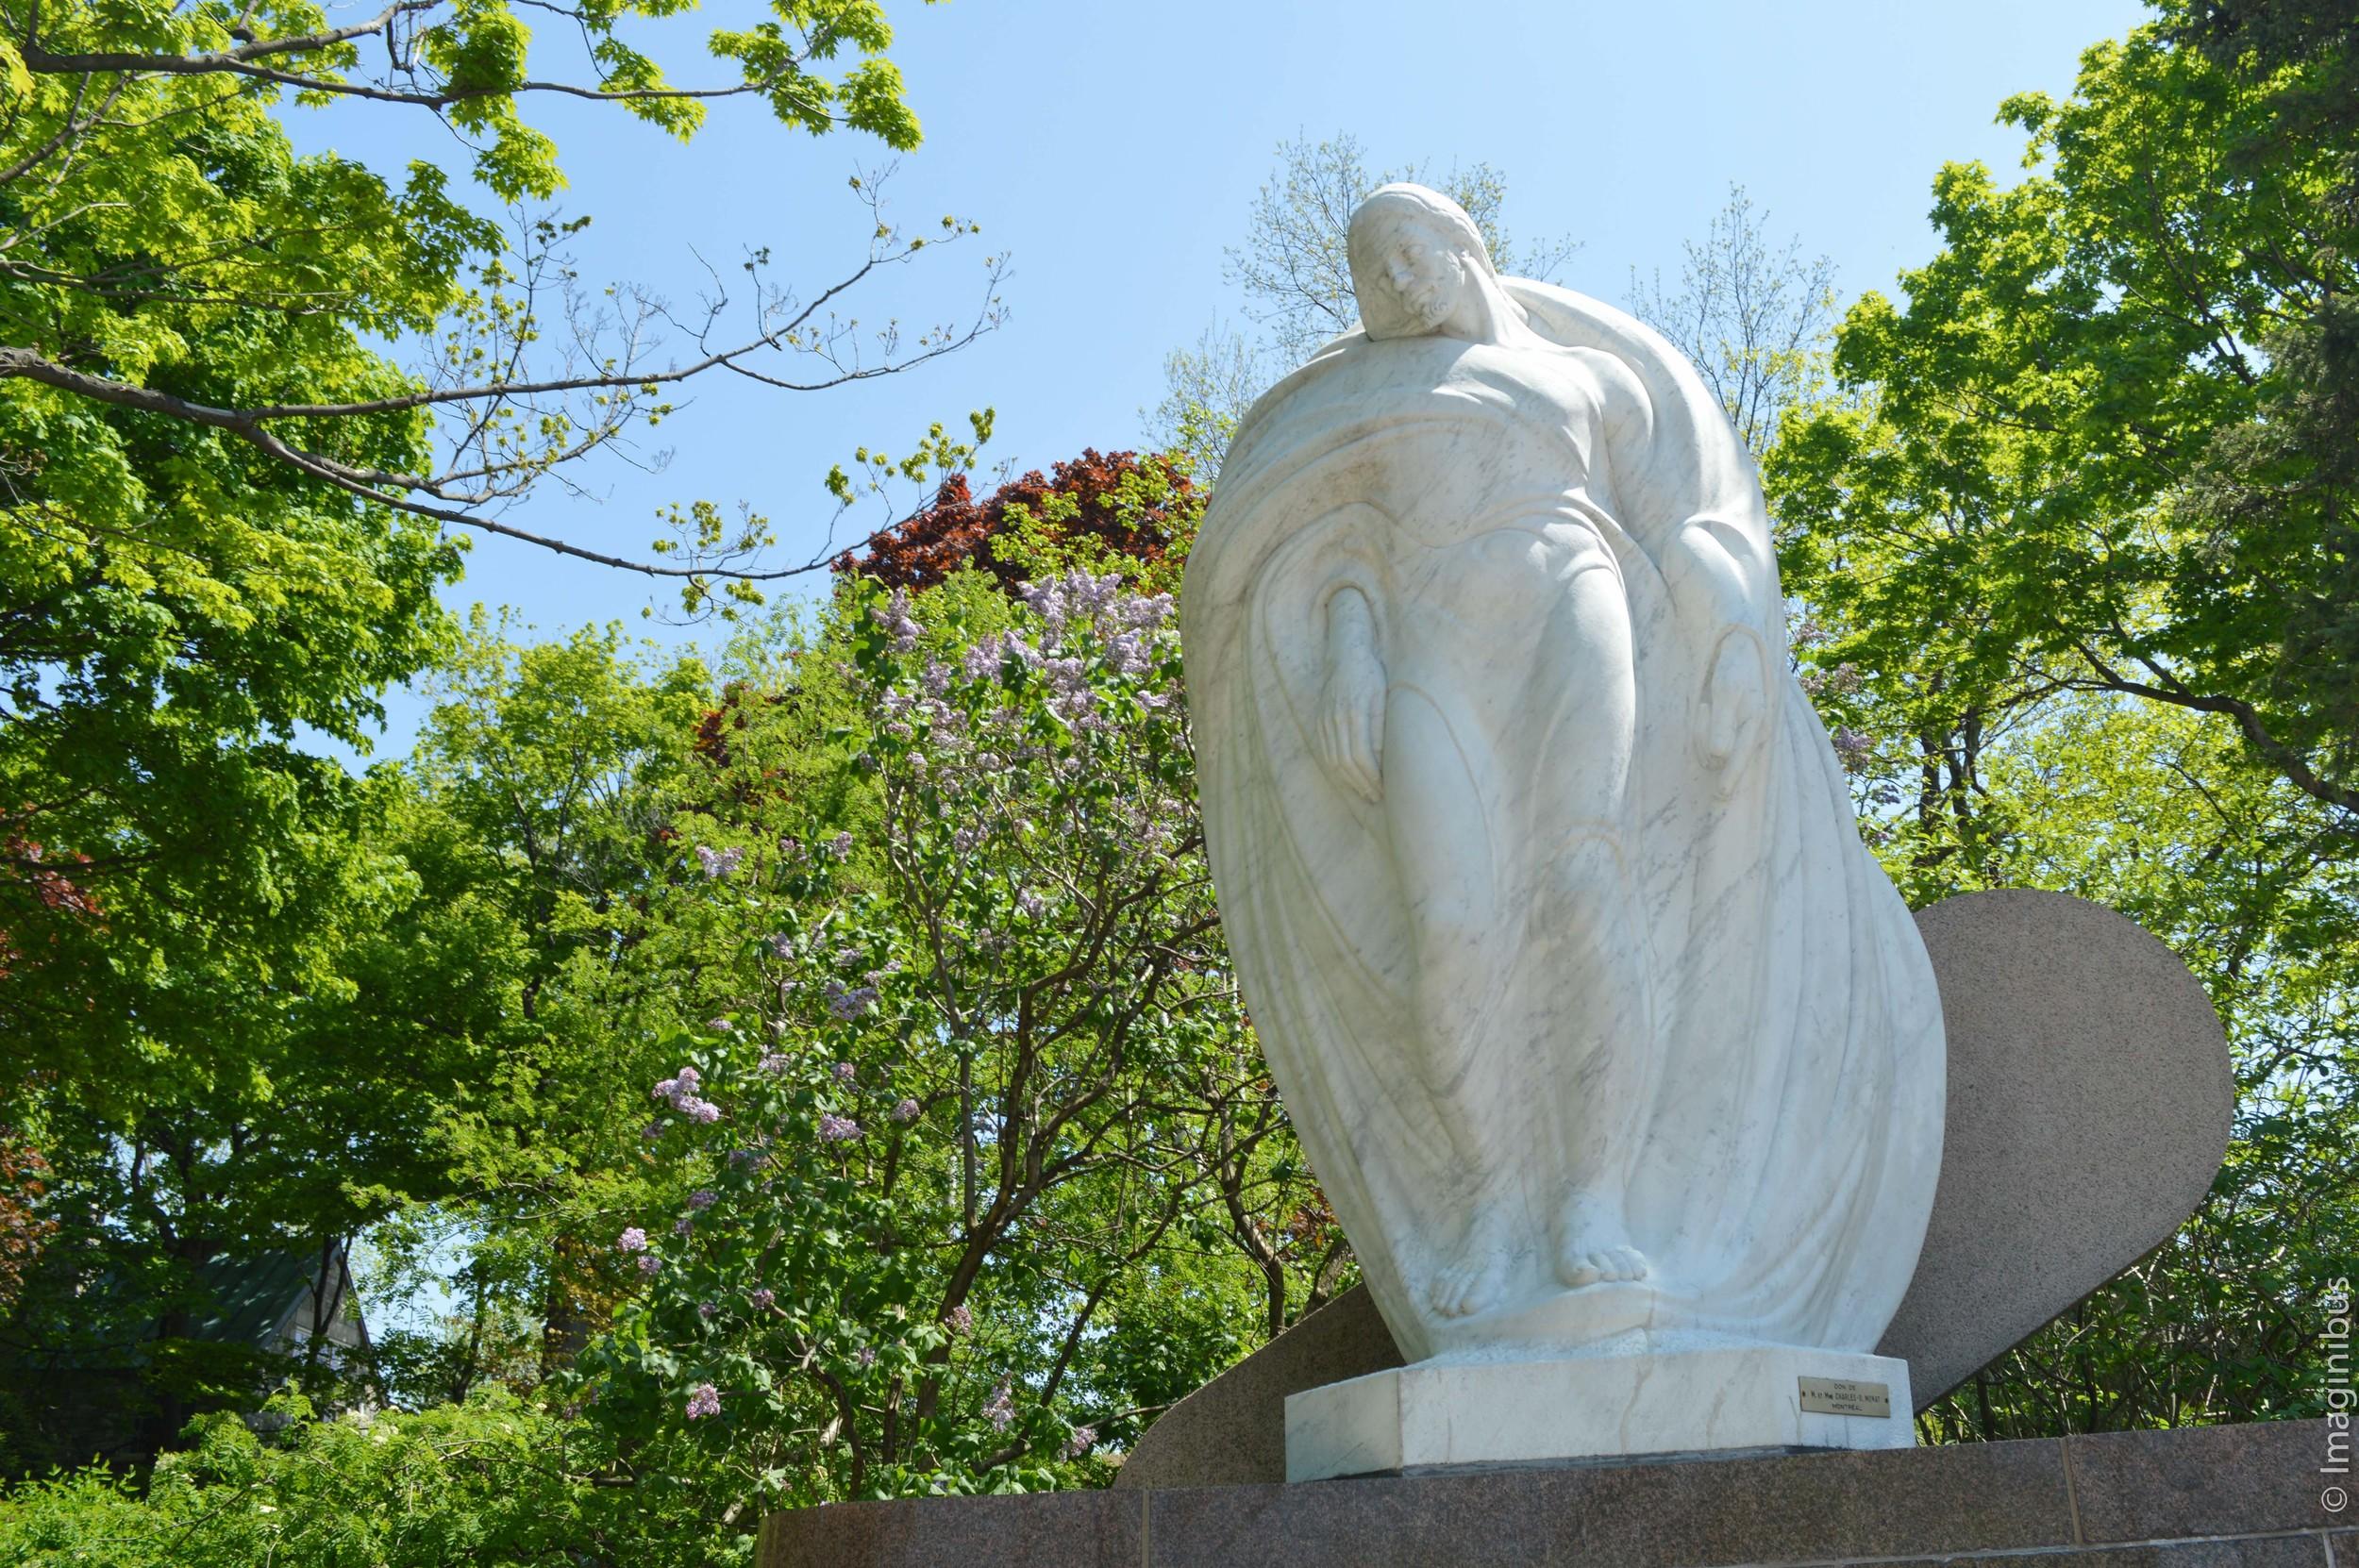 Gardens of the Way of the Cross - Saint-Joseph's Oratory of Mount Royal